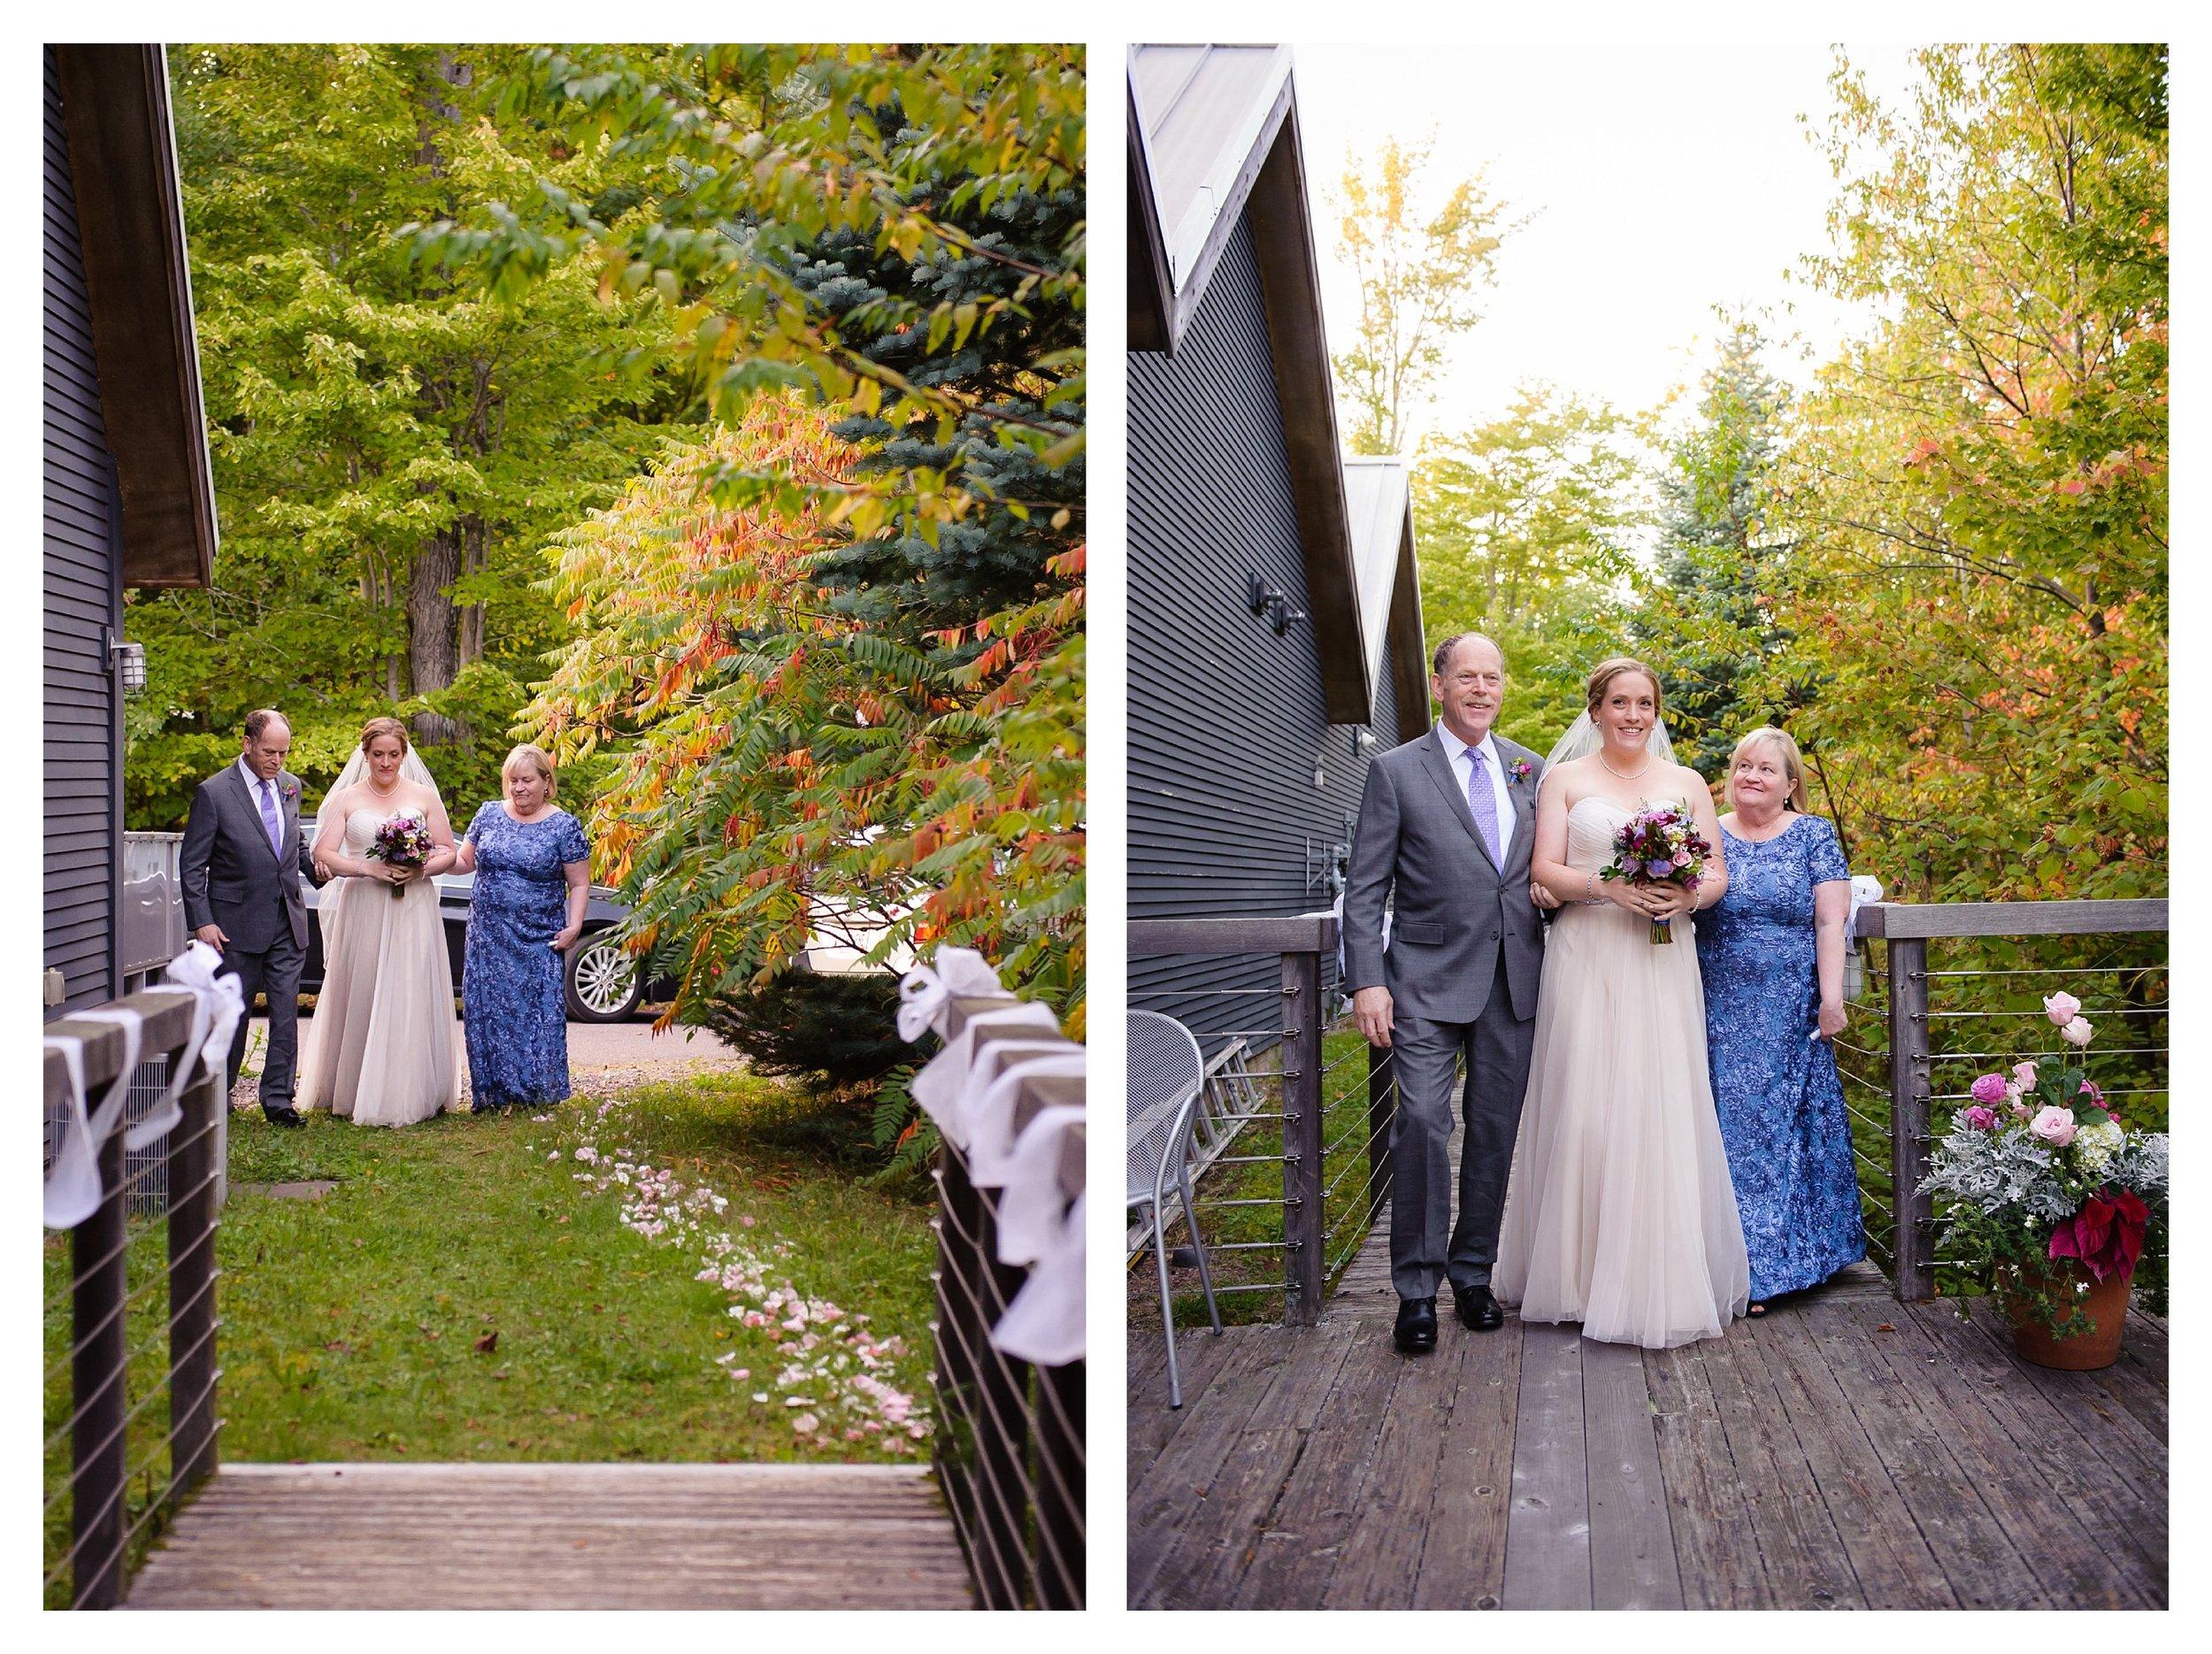 Lindstrom MN Twin cities Minnesota northwoods Bayfield wisconsin destination wedding ps 139 photography_0489.jpg